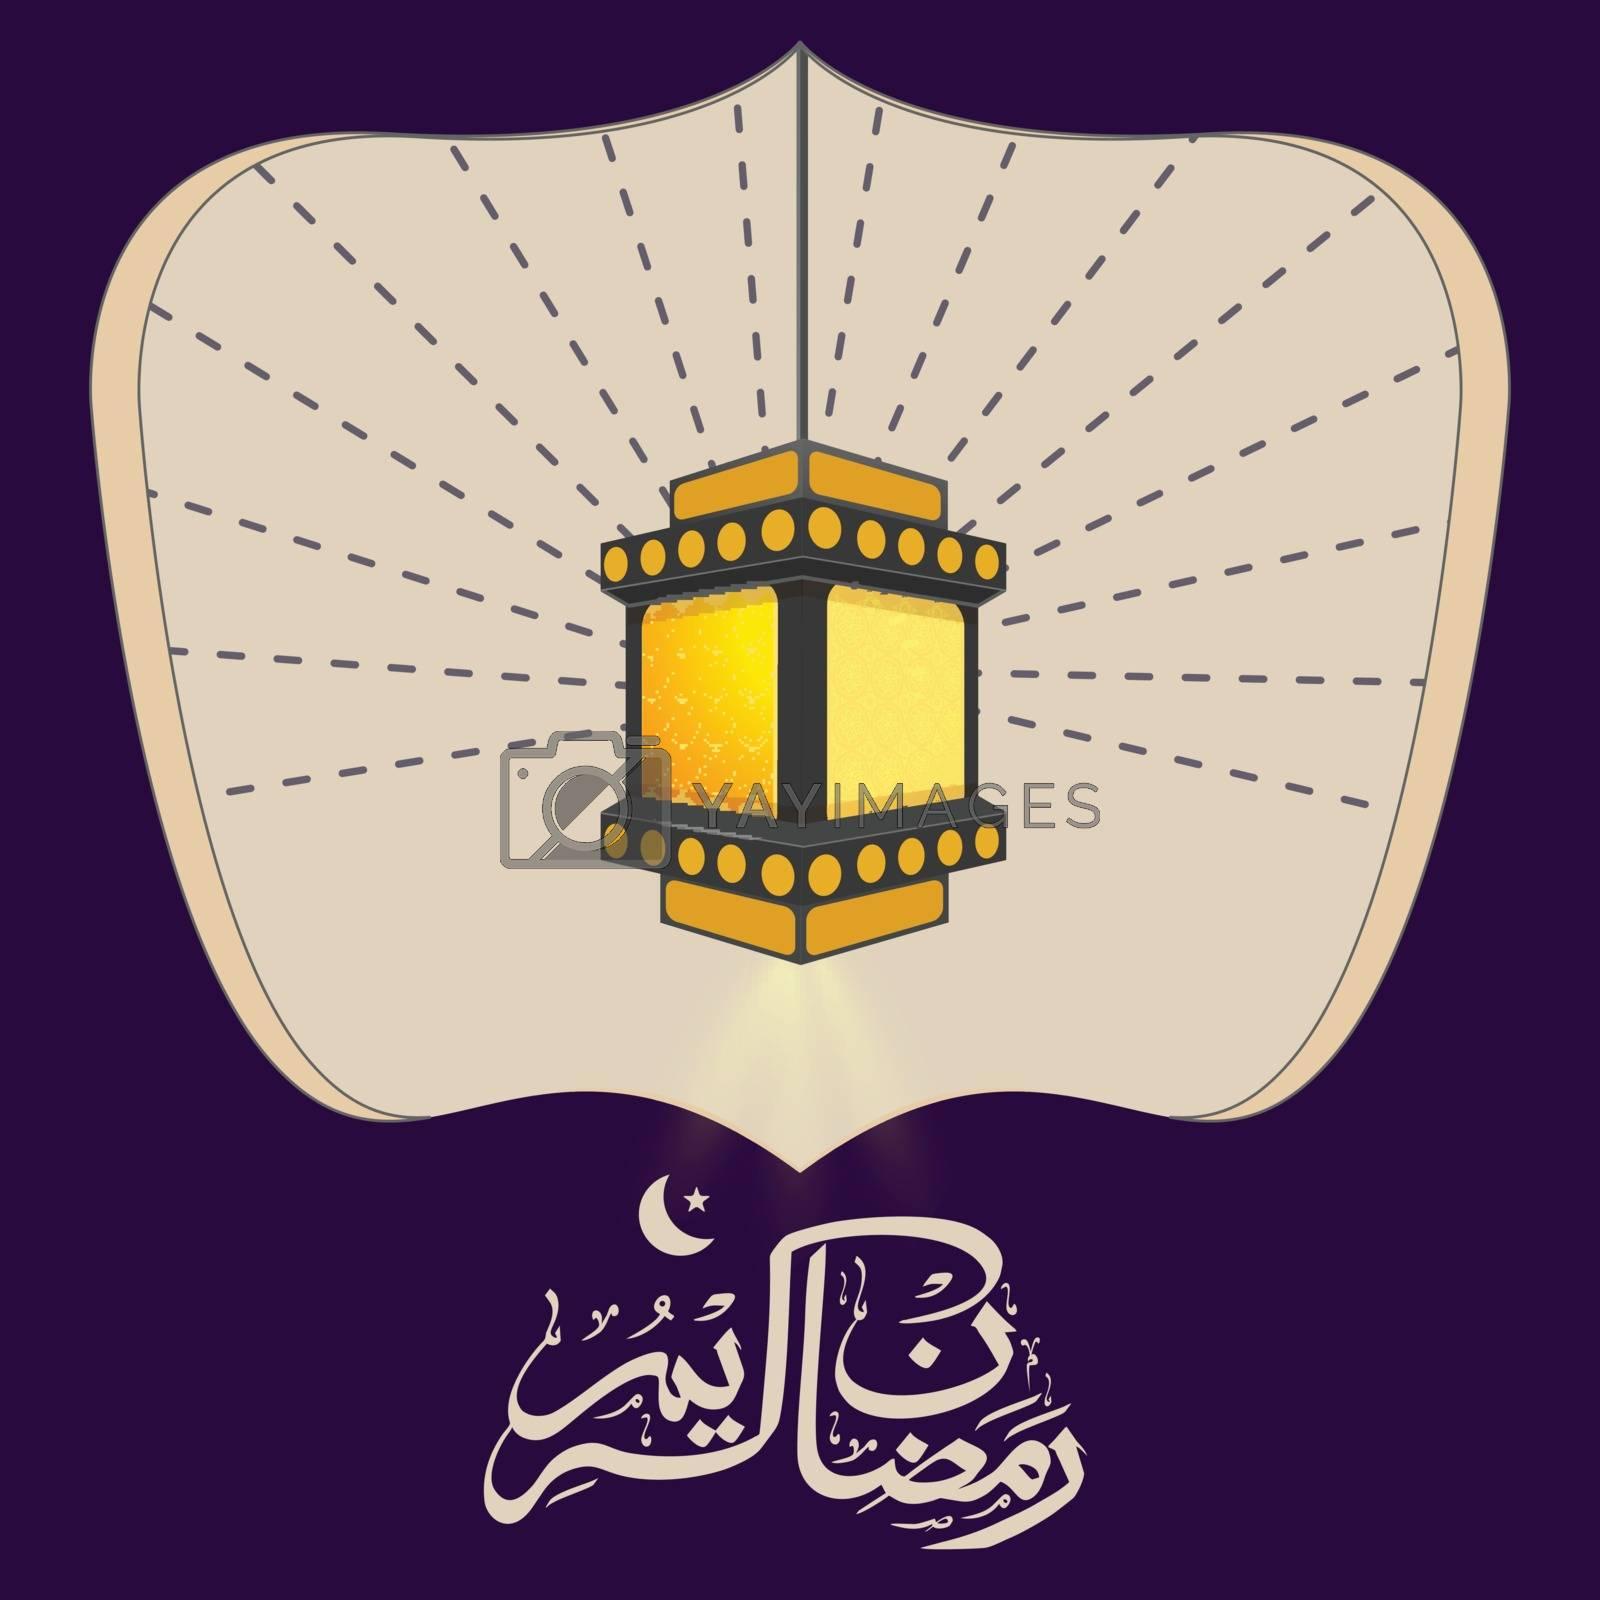 Arabic calligraphy text Ramazan Kareem (Ramadan Kareem) with hanging traditional lamp or lantern for holy month of muslim community festival  celebration.